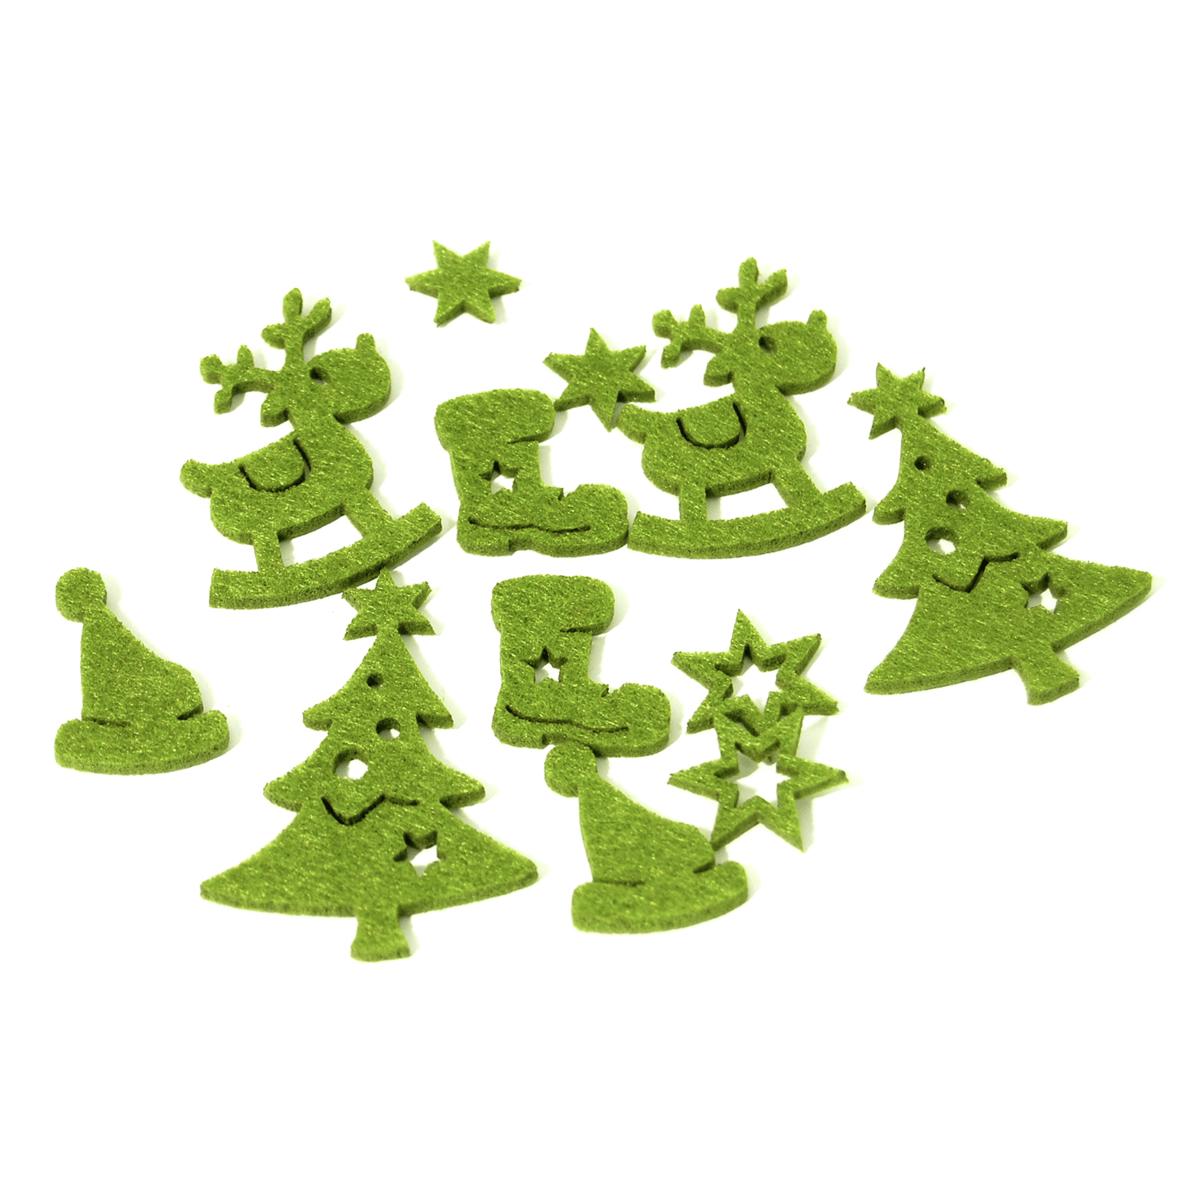 12 x Christmas Felt Assorted Green Embellishments Craft